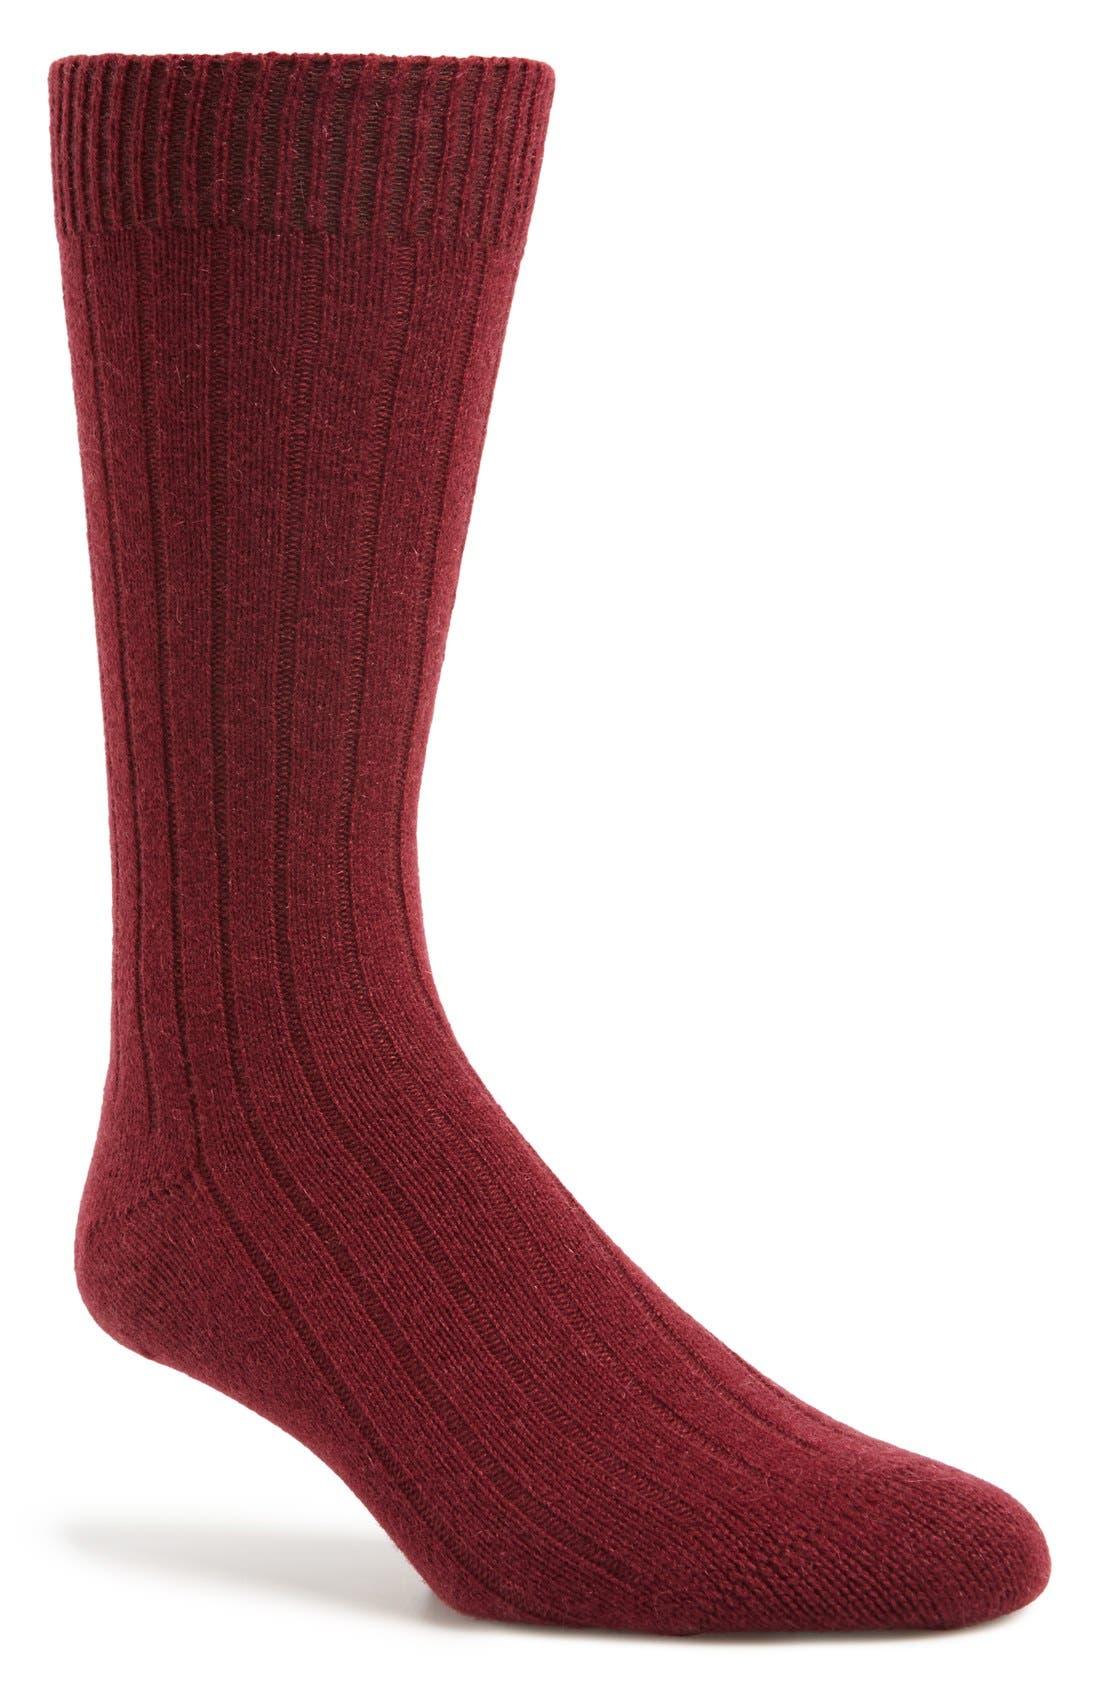 'Waddington' Cashmere Blend Mid Calf Socks,                             Main thumbnail 11, color,